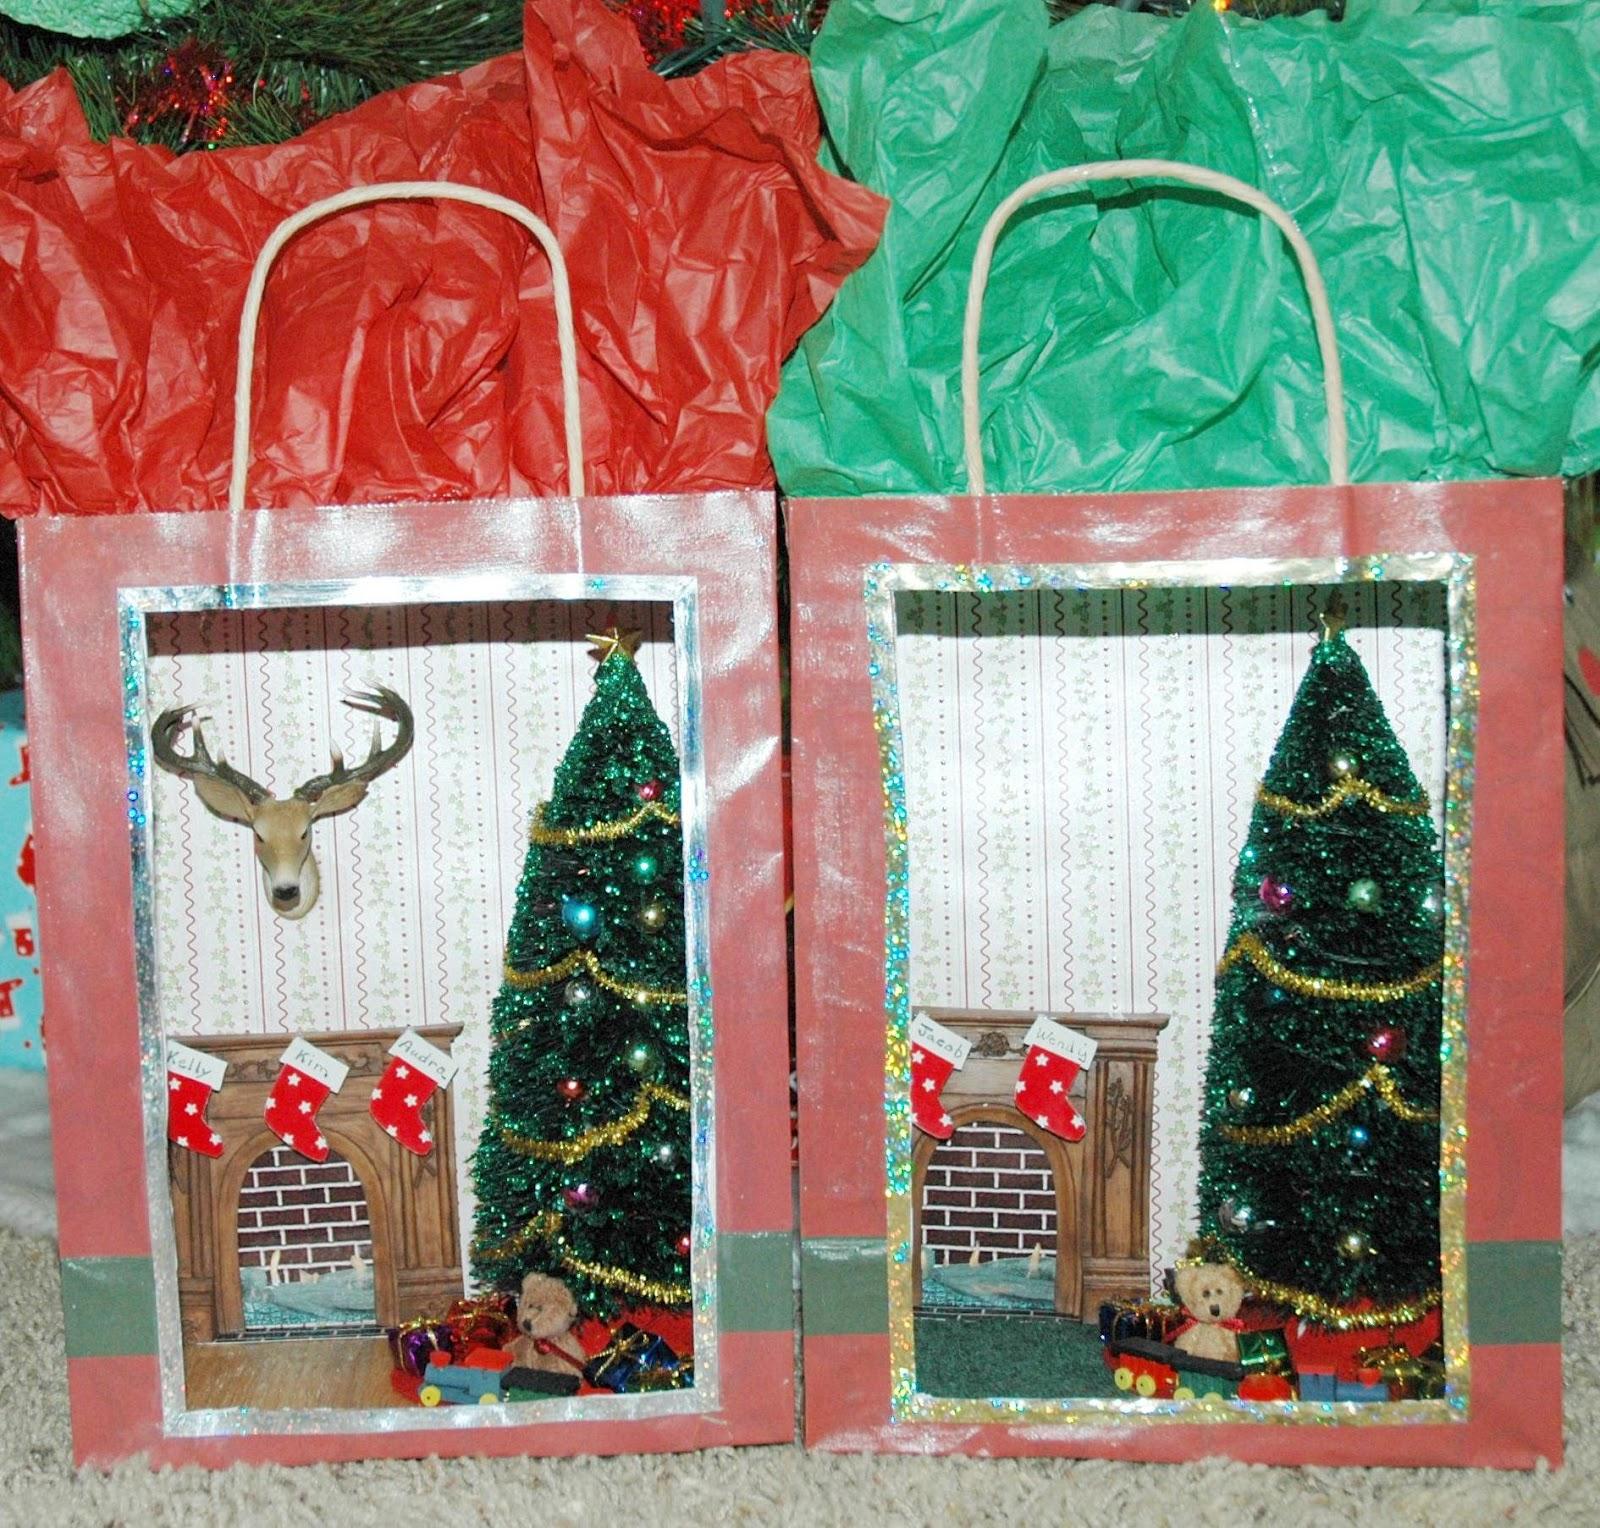 Honey, I Shrunk The House!: Holiday Mini Scene In